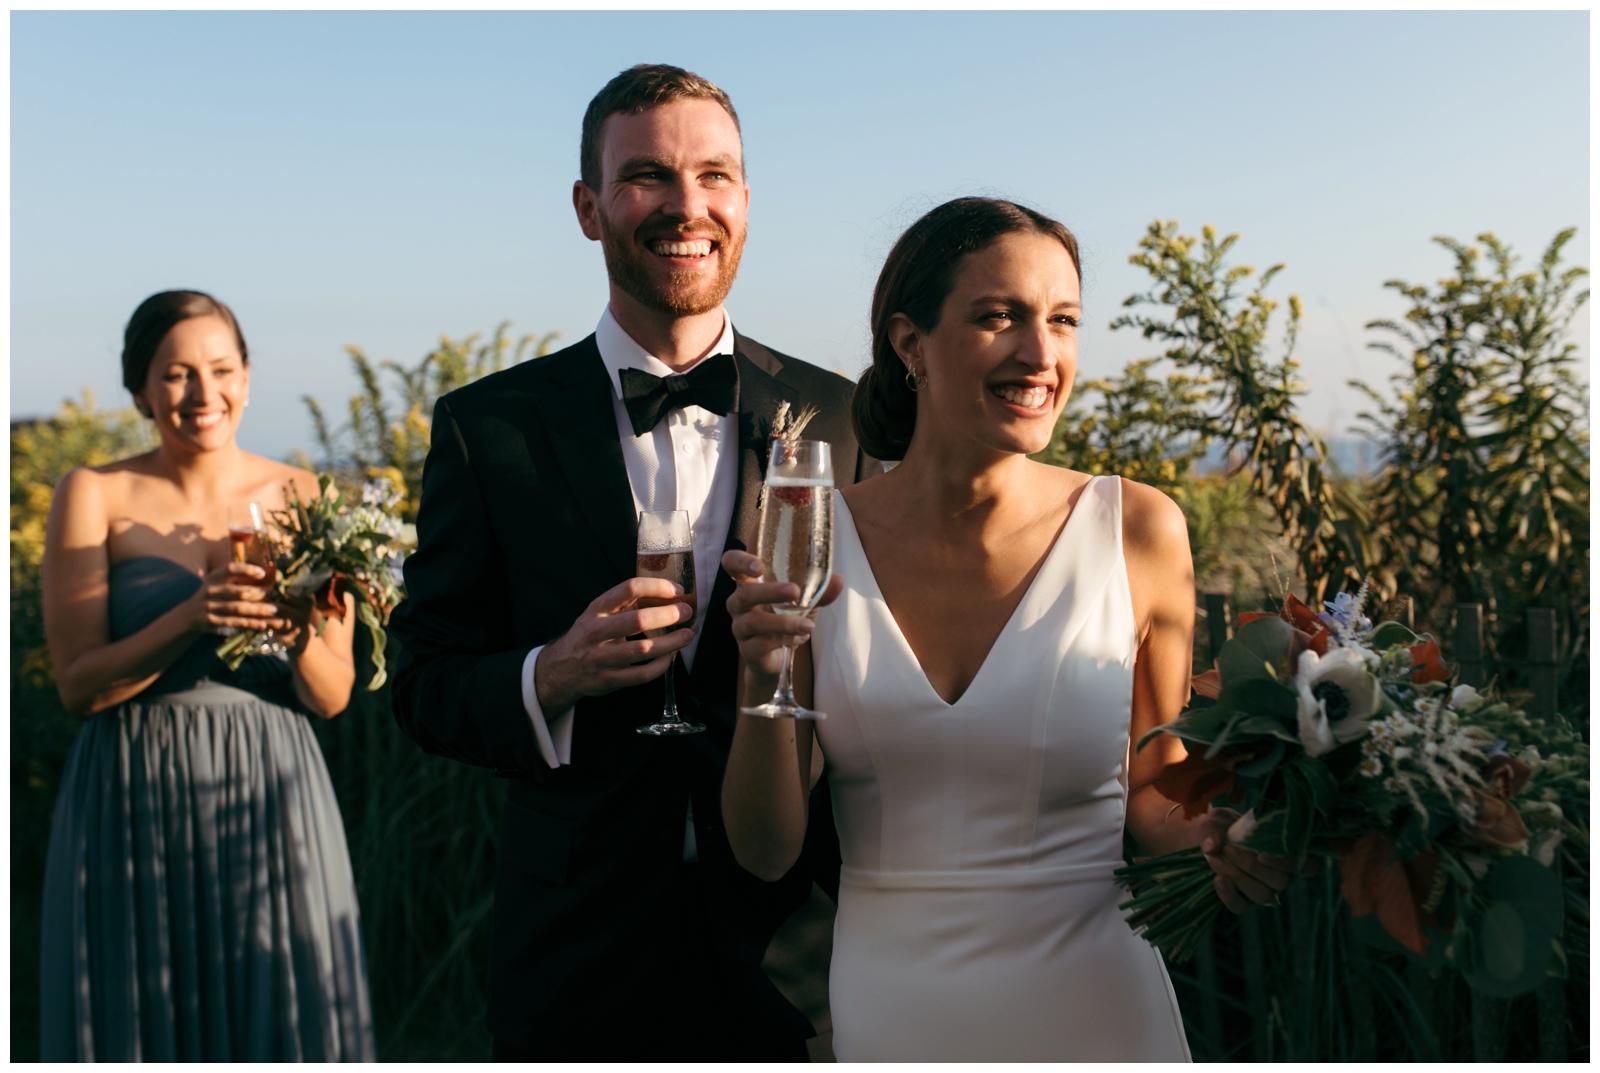 Madison-Beach-Hotel-Wedding-Bailey-Q-Photo-Boston-Wedding-Photographer-044.jpg